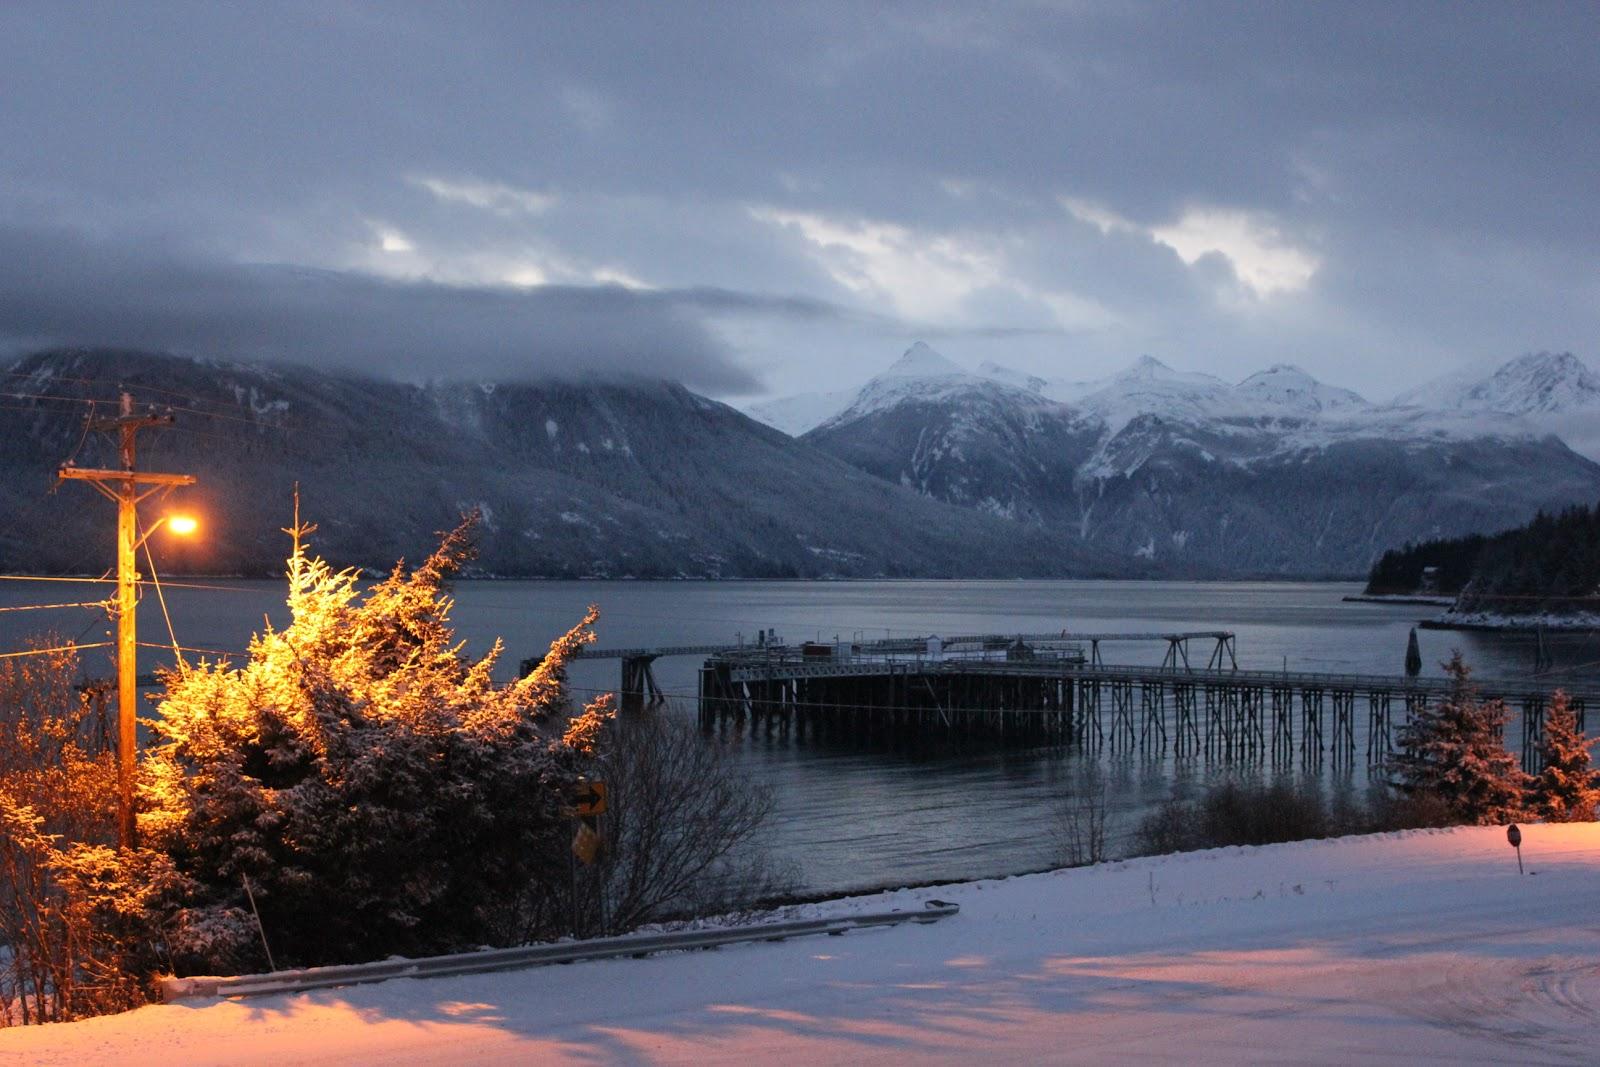 img_2347-jpg.46775_Preparing for Winter in Alaska :: Rose Hips :: Dried Seaweed_Wilderness Survival_Squat the Planet_3:33 PM